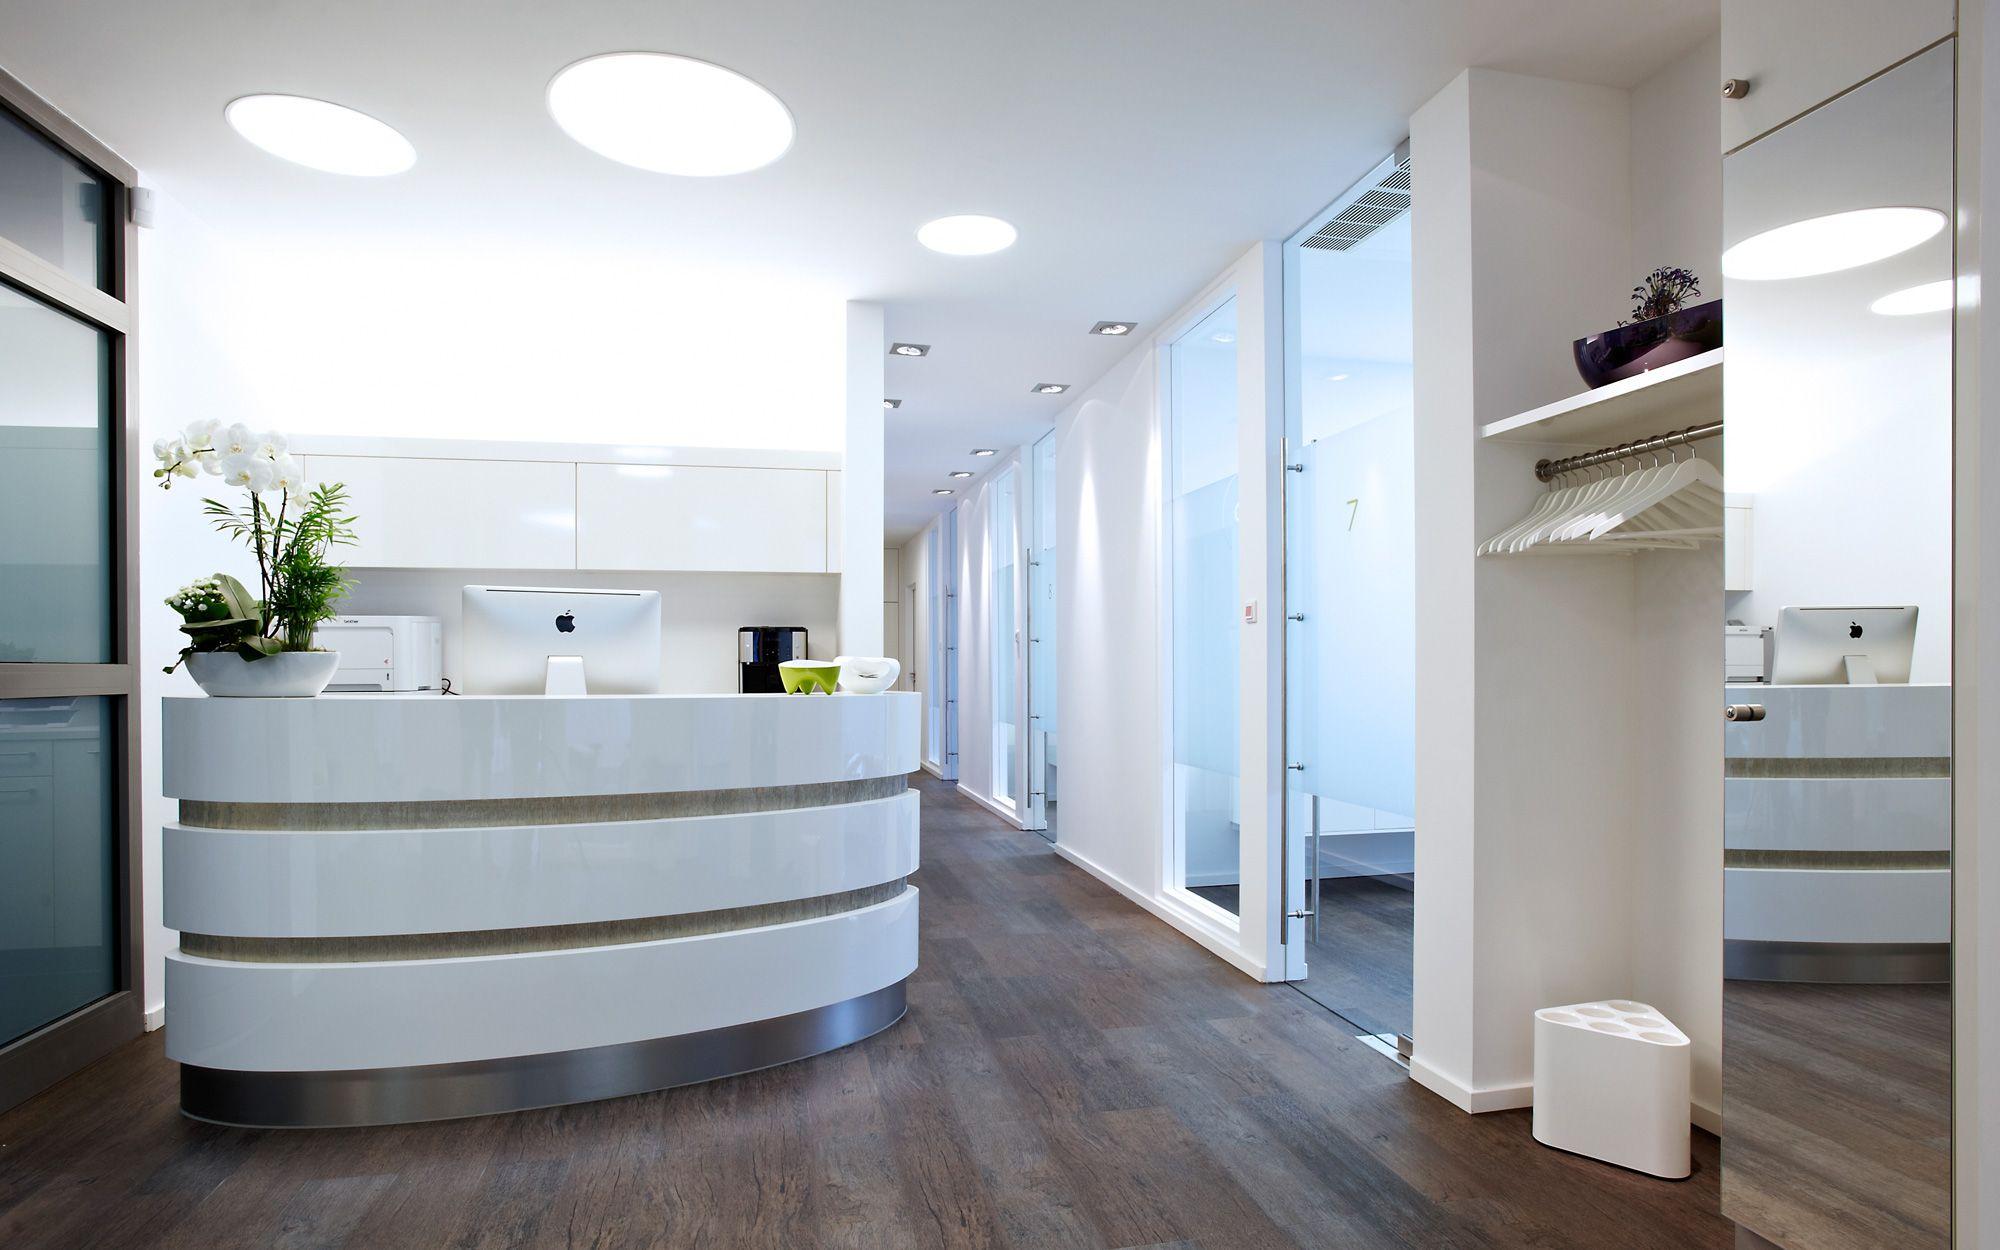 360 zahn zahnarzt d sseldorf reception pinterest. Black Bedroom Furniture Sets. Home Design Ideas